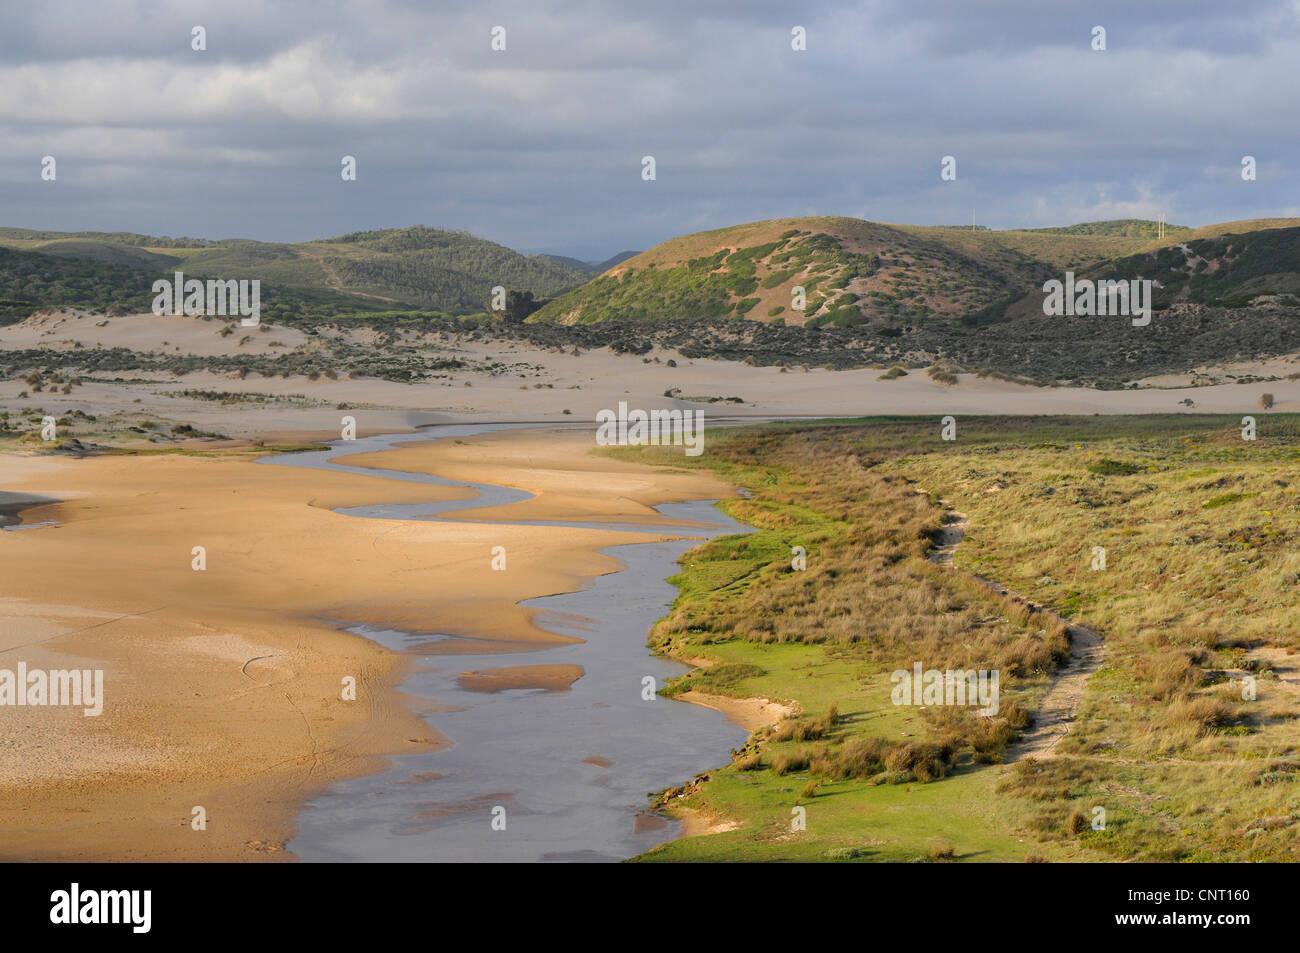 river delta in the Nature Park Carrapateira, Portugal, Algarve - Stock Image